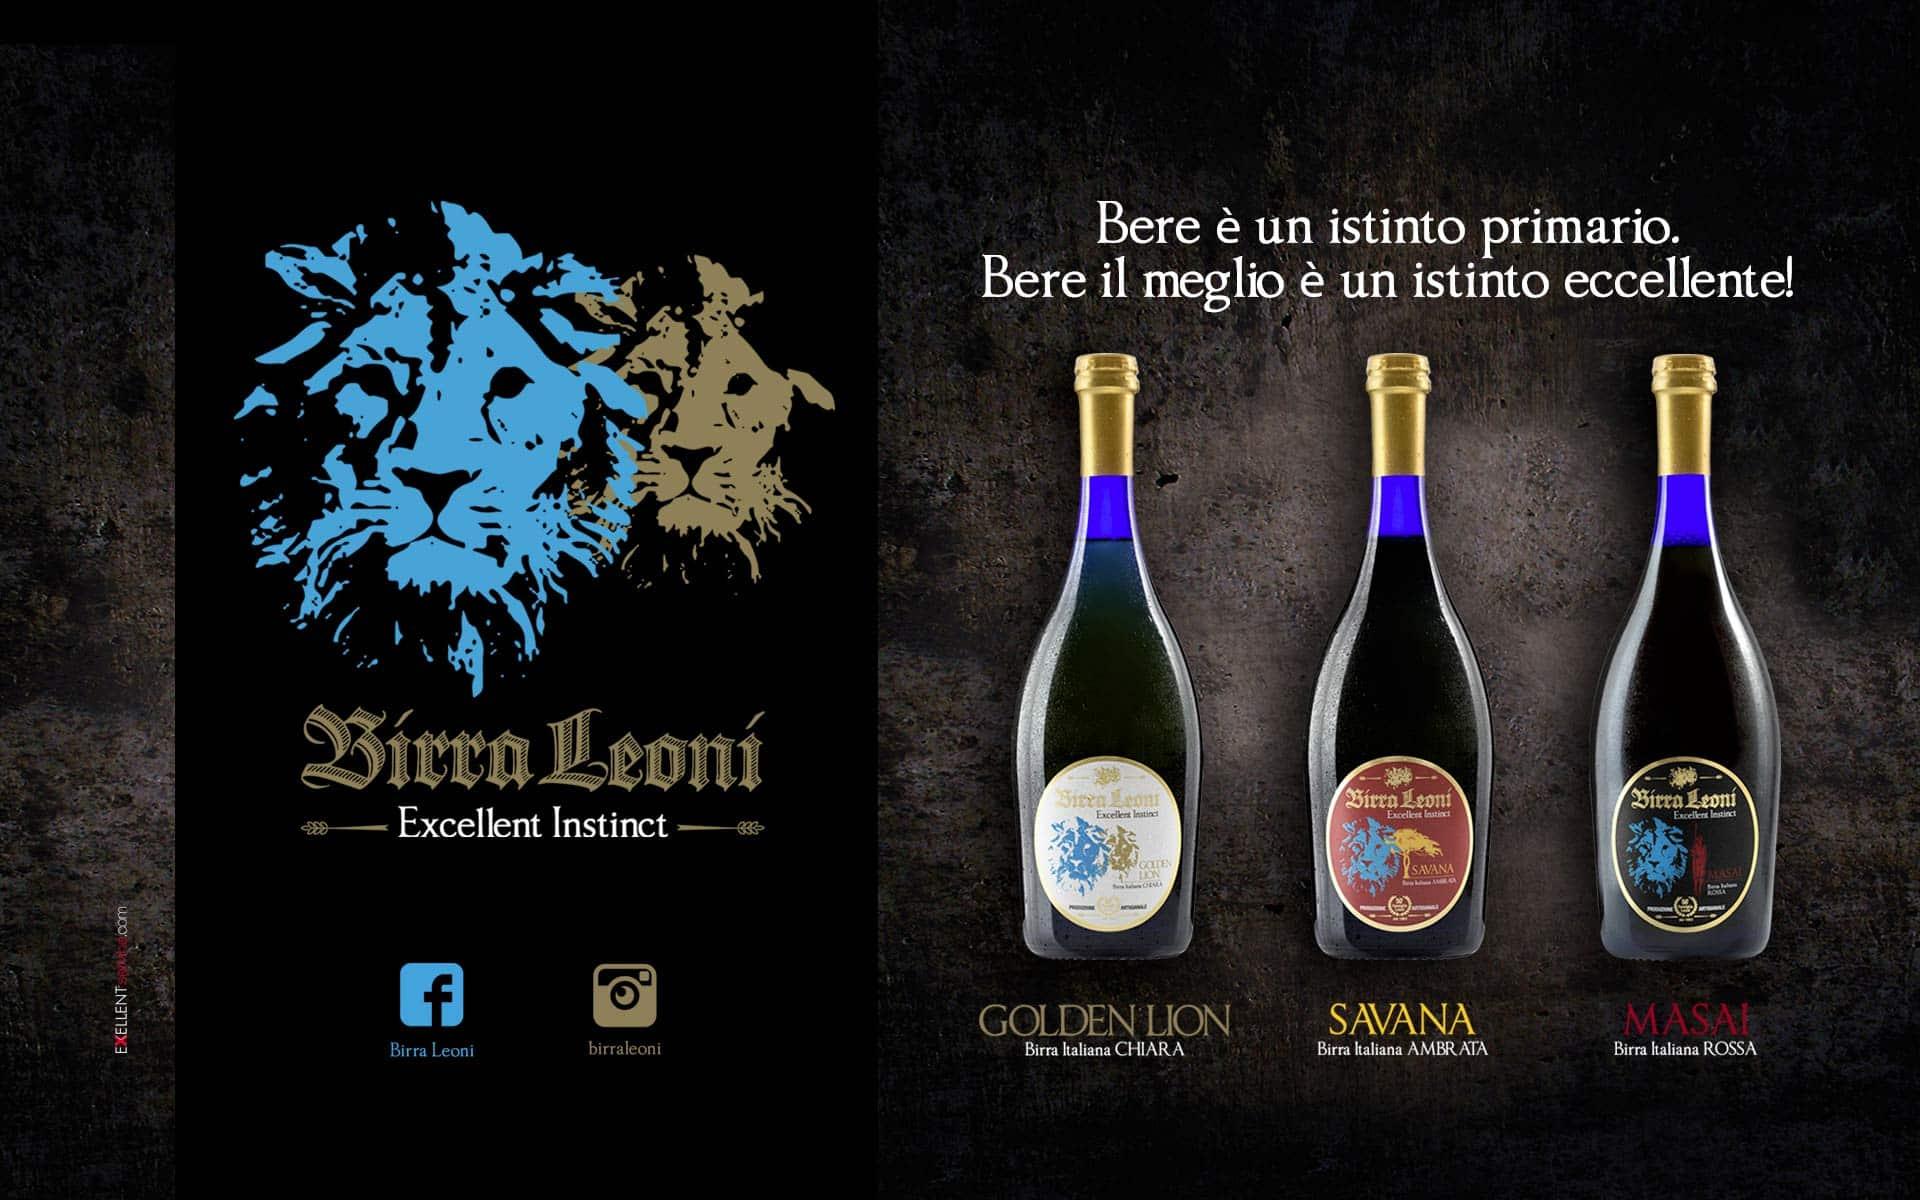 birra leoni, birra artigianale